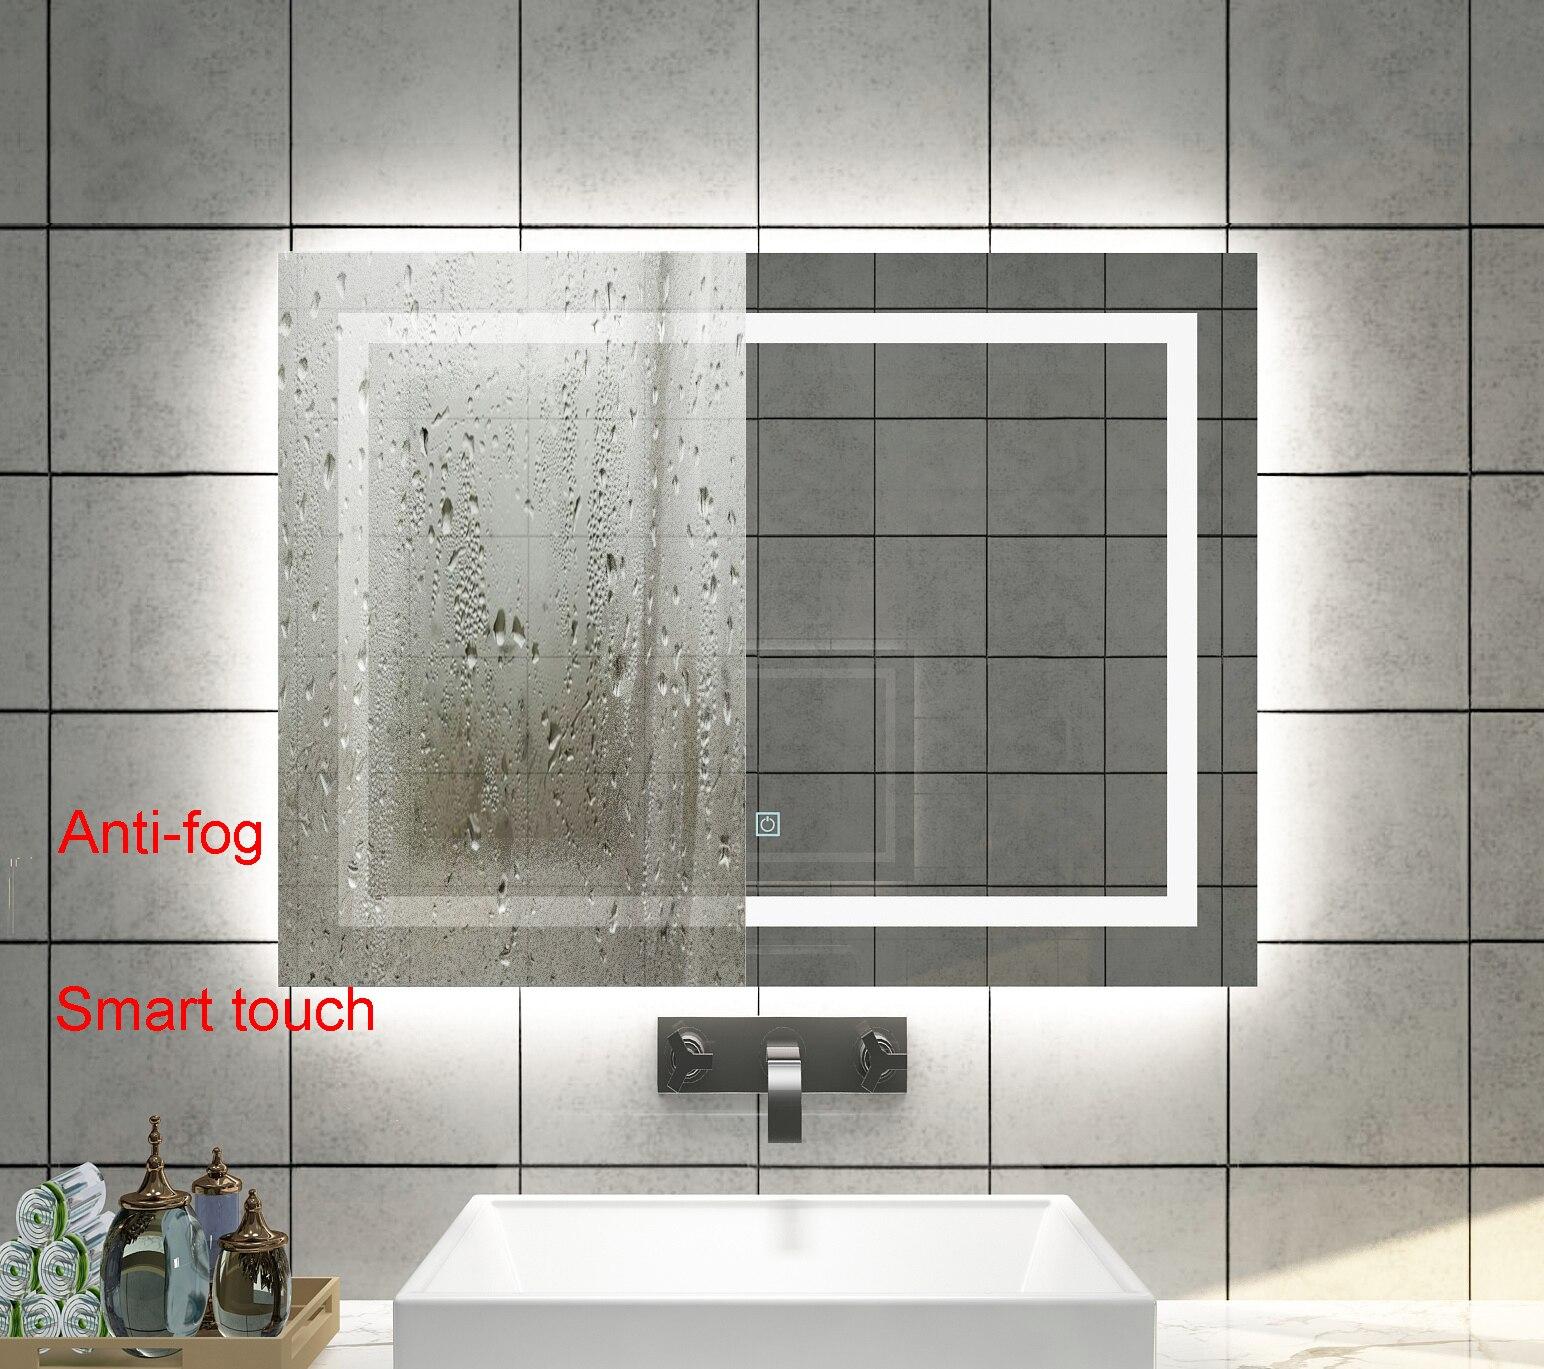 Diyhd Wall Mount Led Lighted Bathroom Mirror Vanity Defogger Square Lights Touch Light Mirror Led Wall Mount Mirror Square Bathroom Mirrorwall Bathroom Mirror Aliexpress